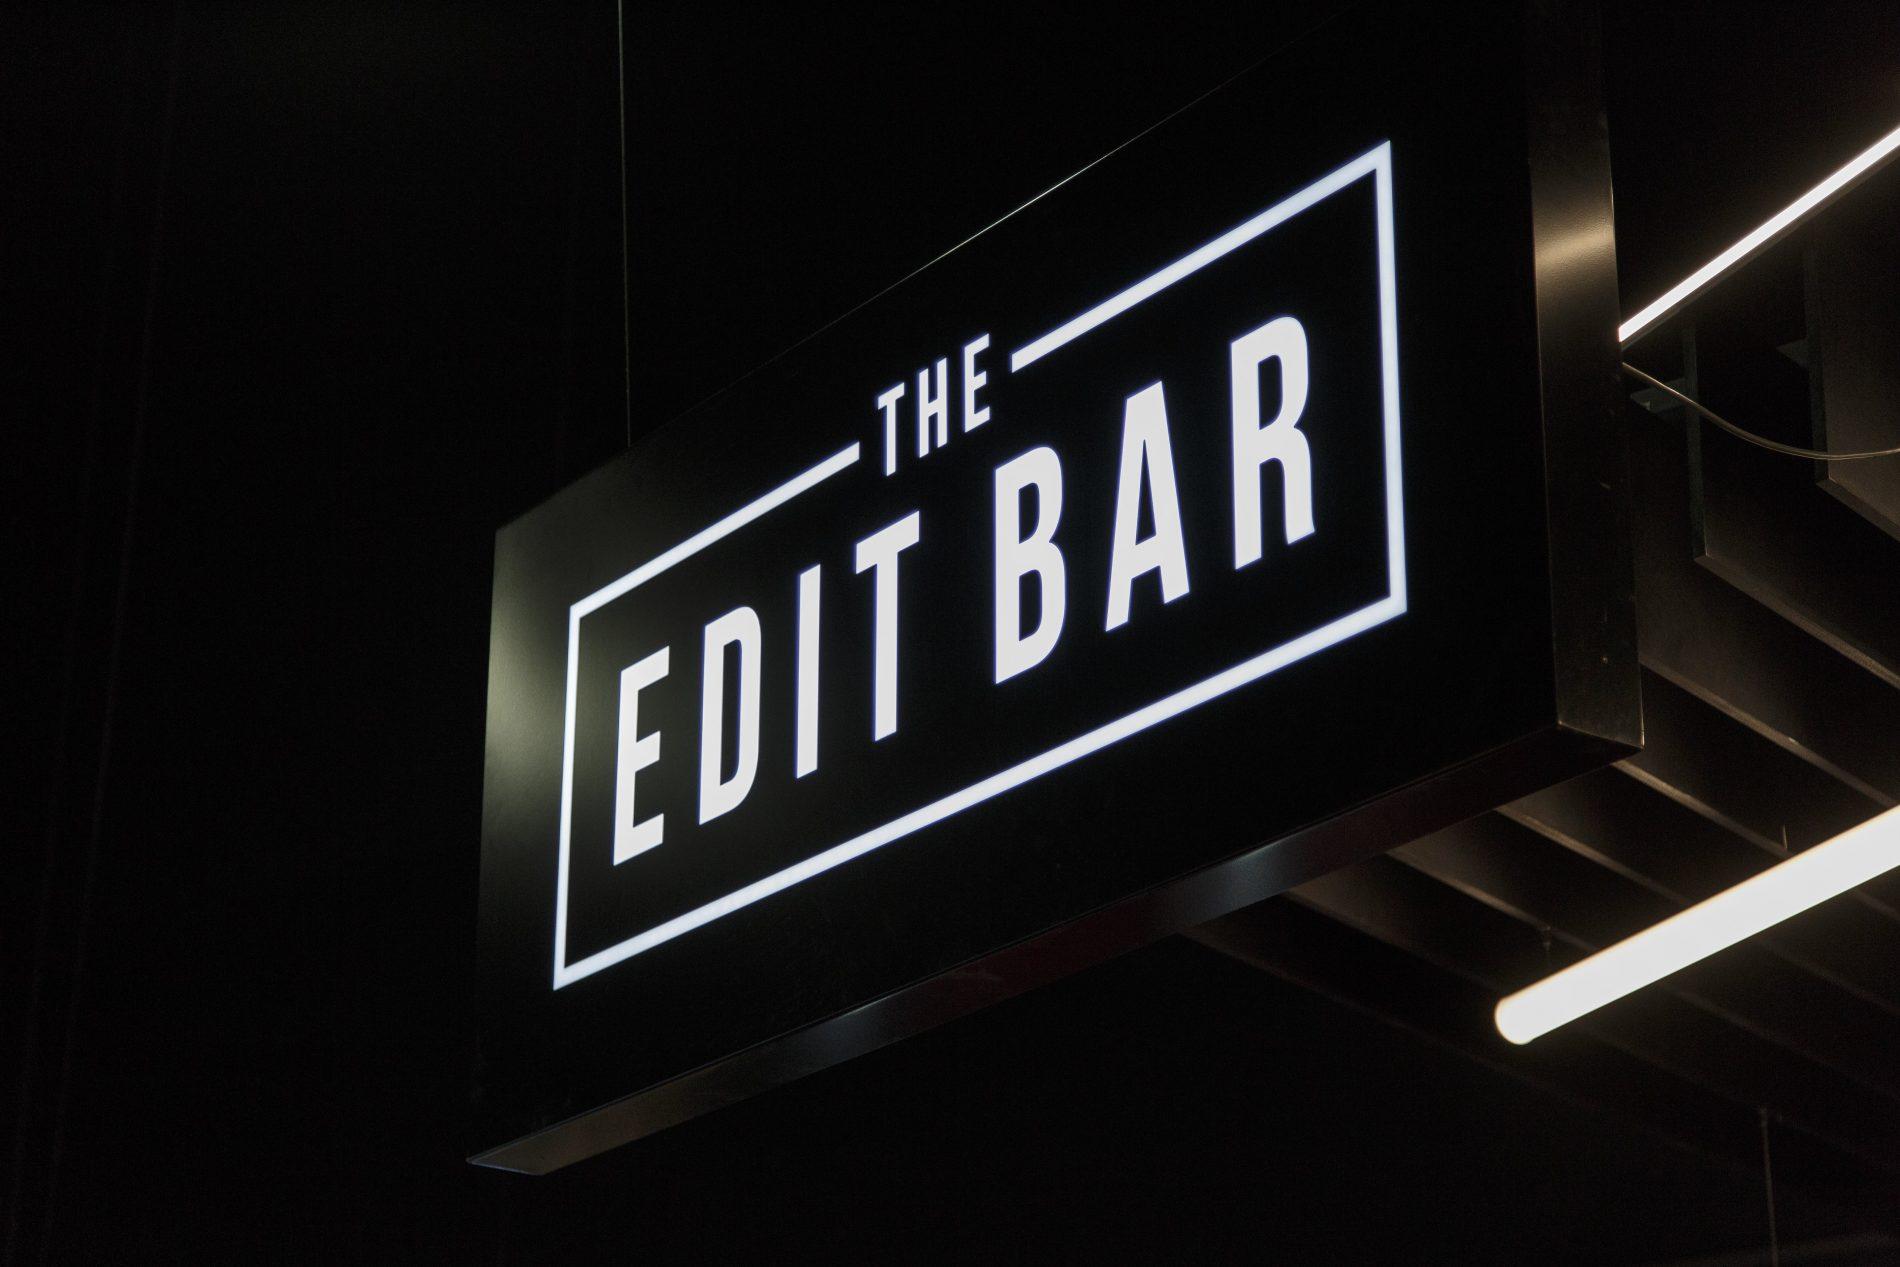 beyond london The Edit Bar Vue retail design signage